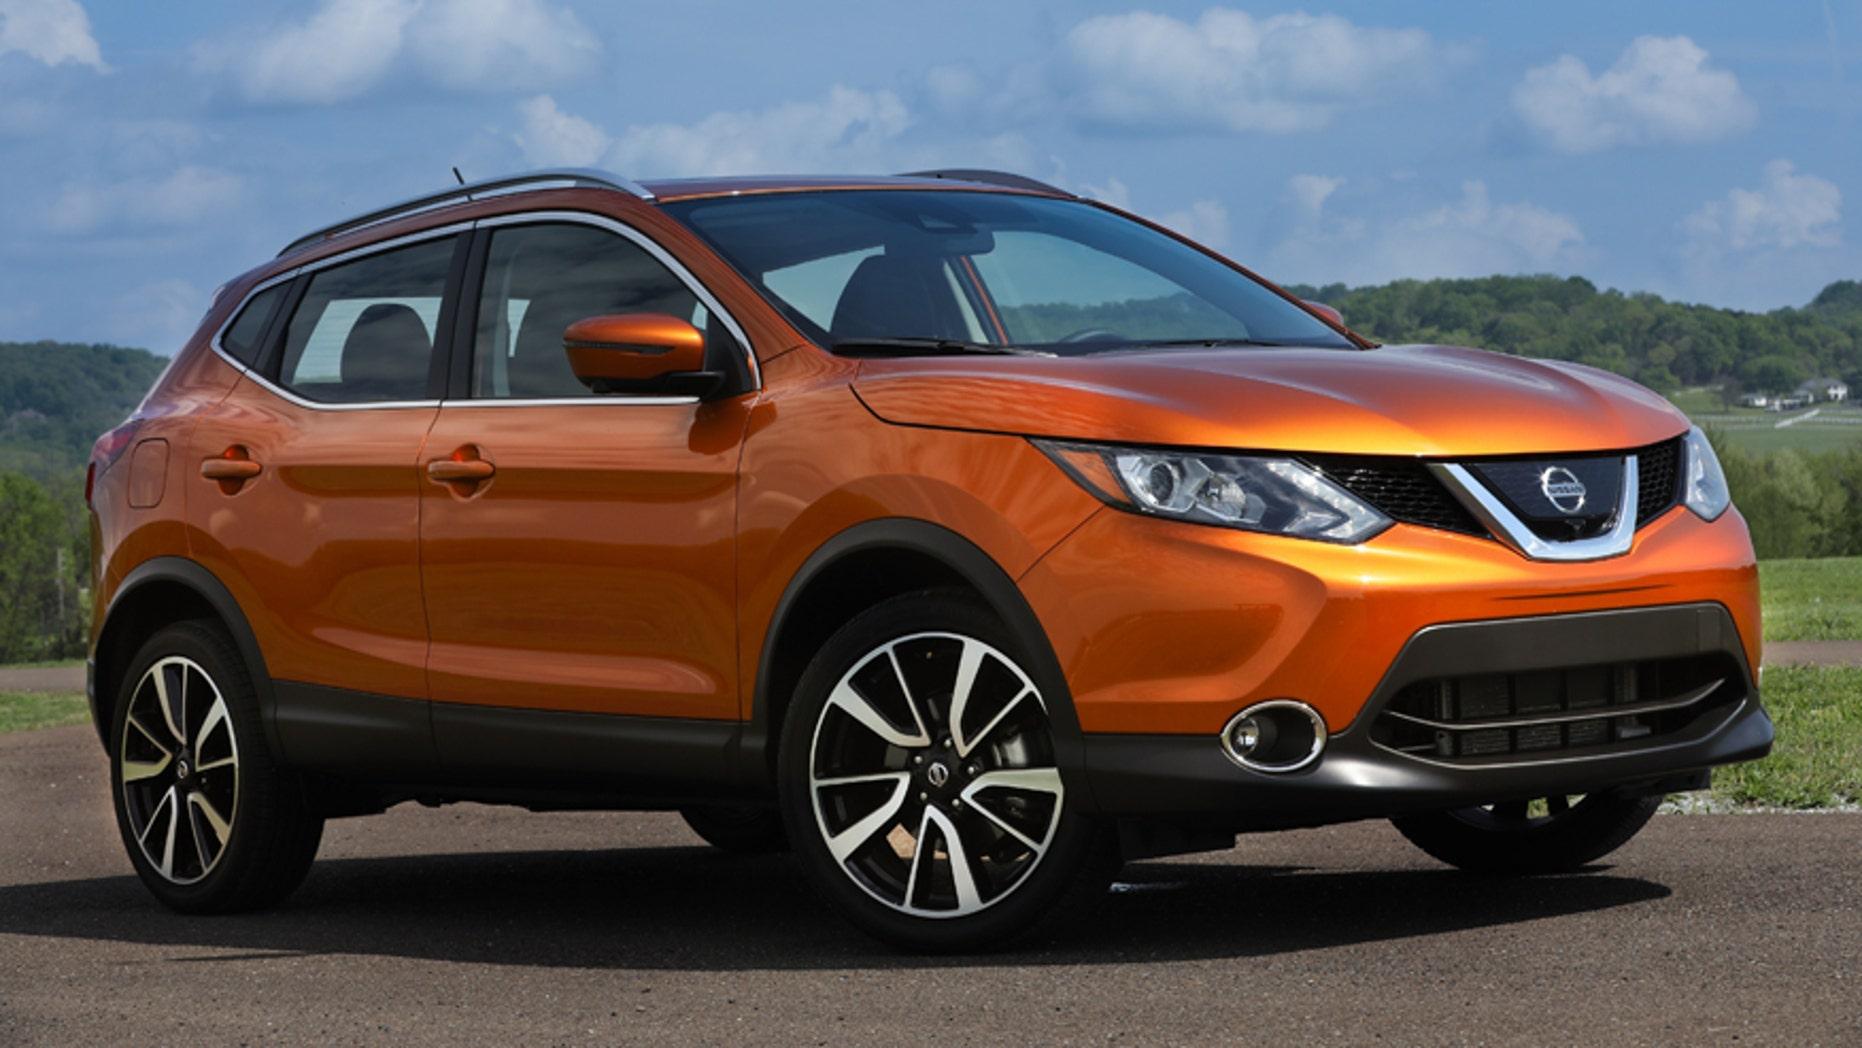 2017 Nissan Rogue Sport test drive | Fox News